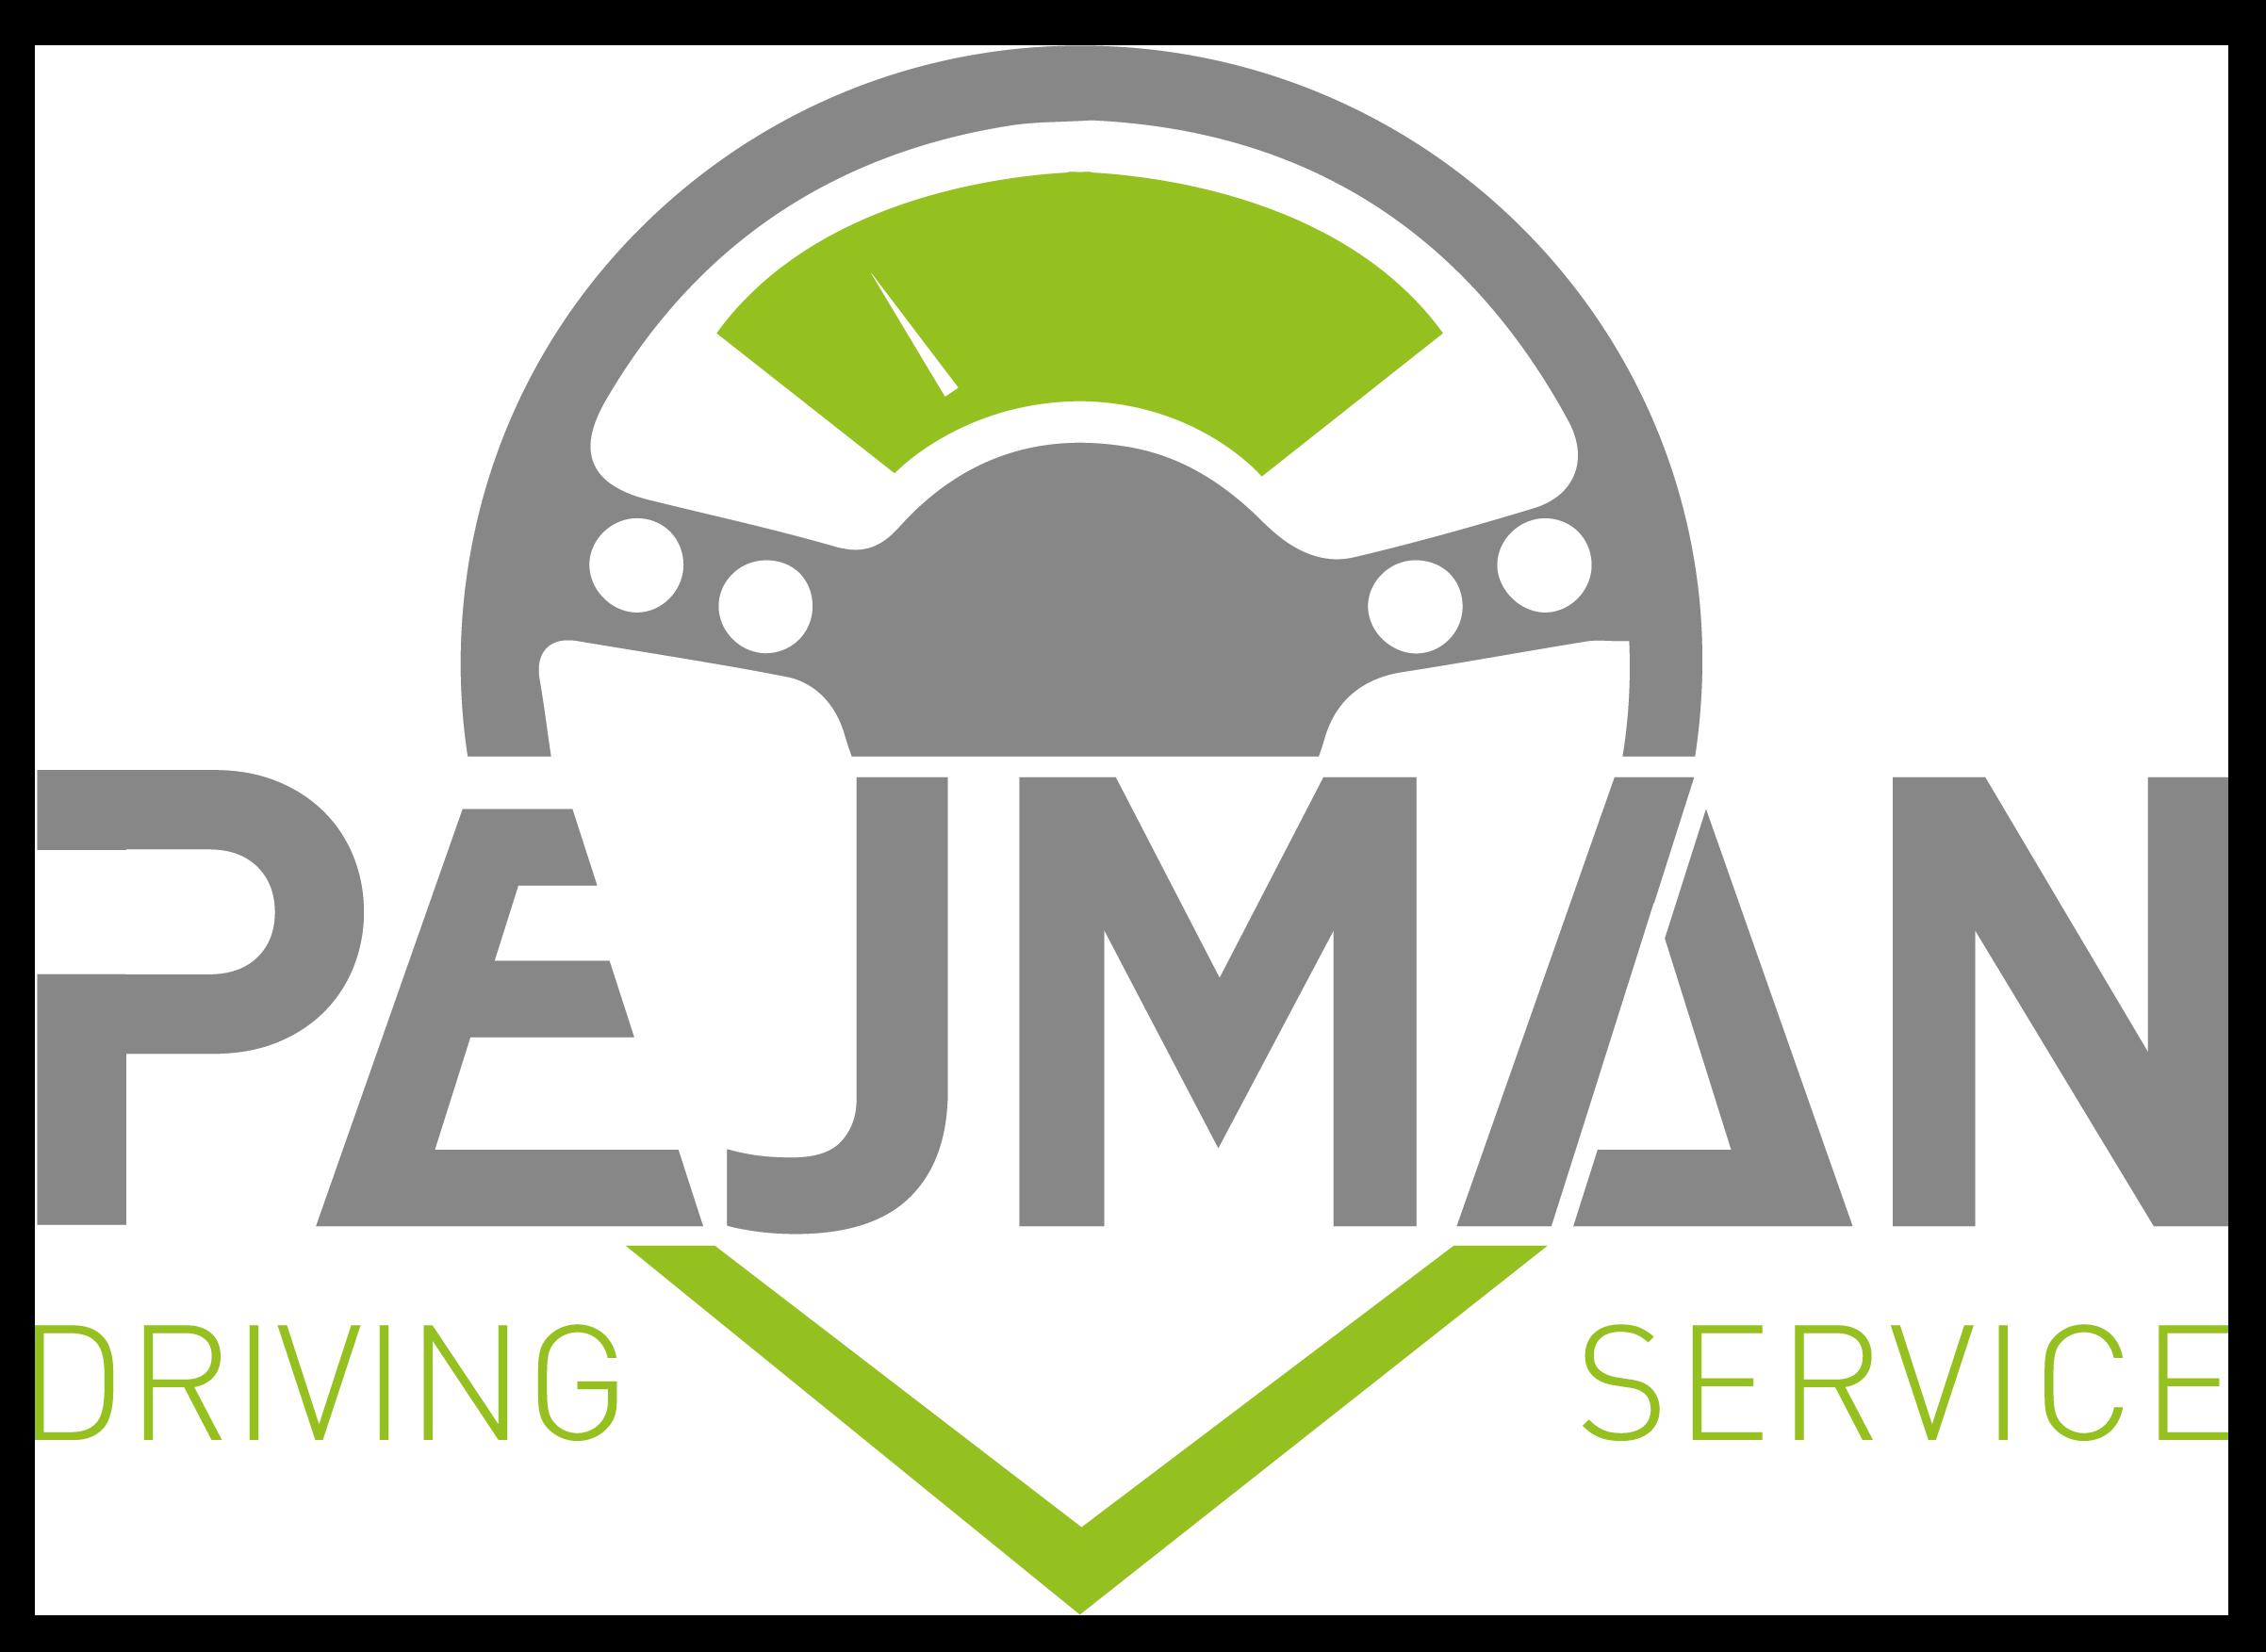 Pejman Driving Service